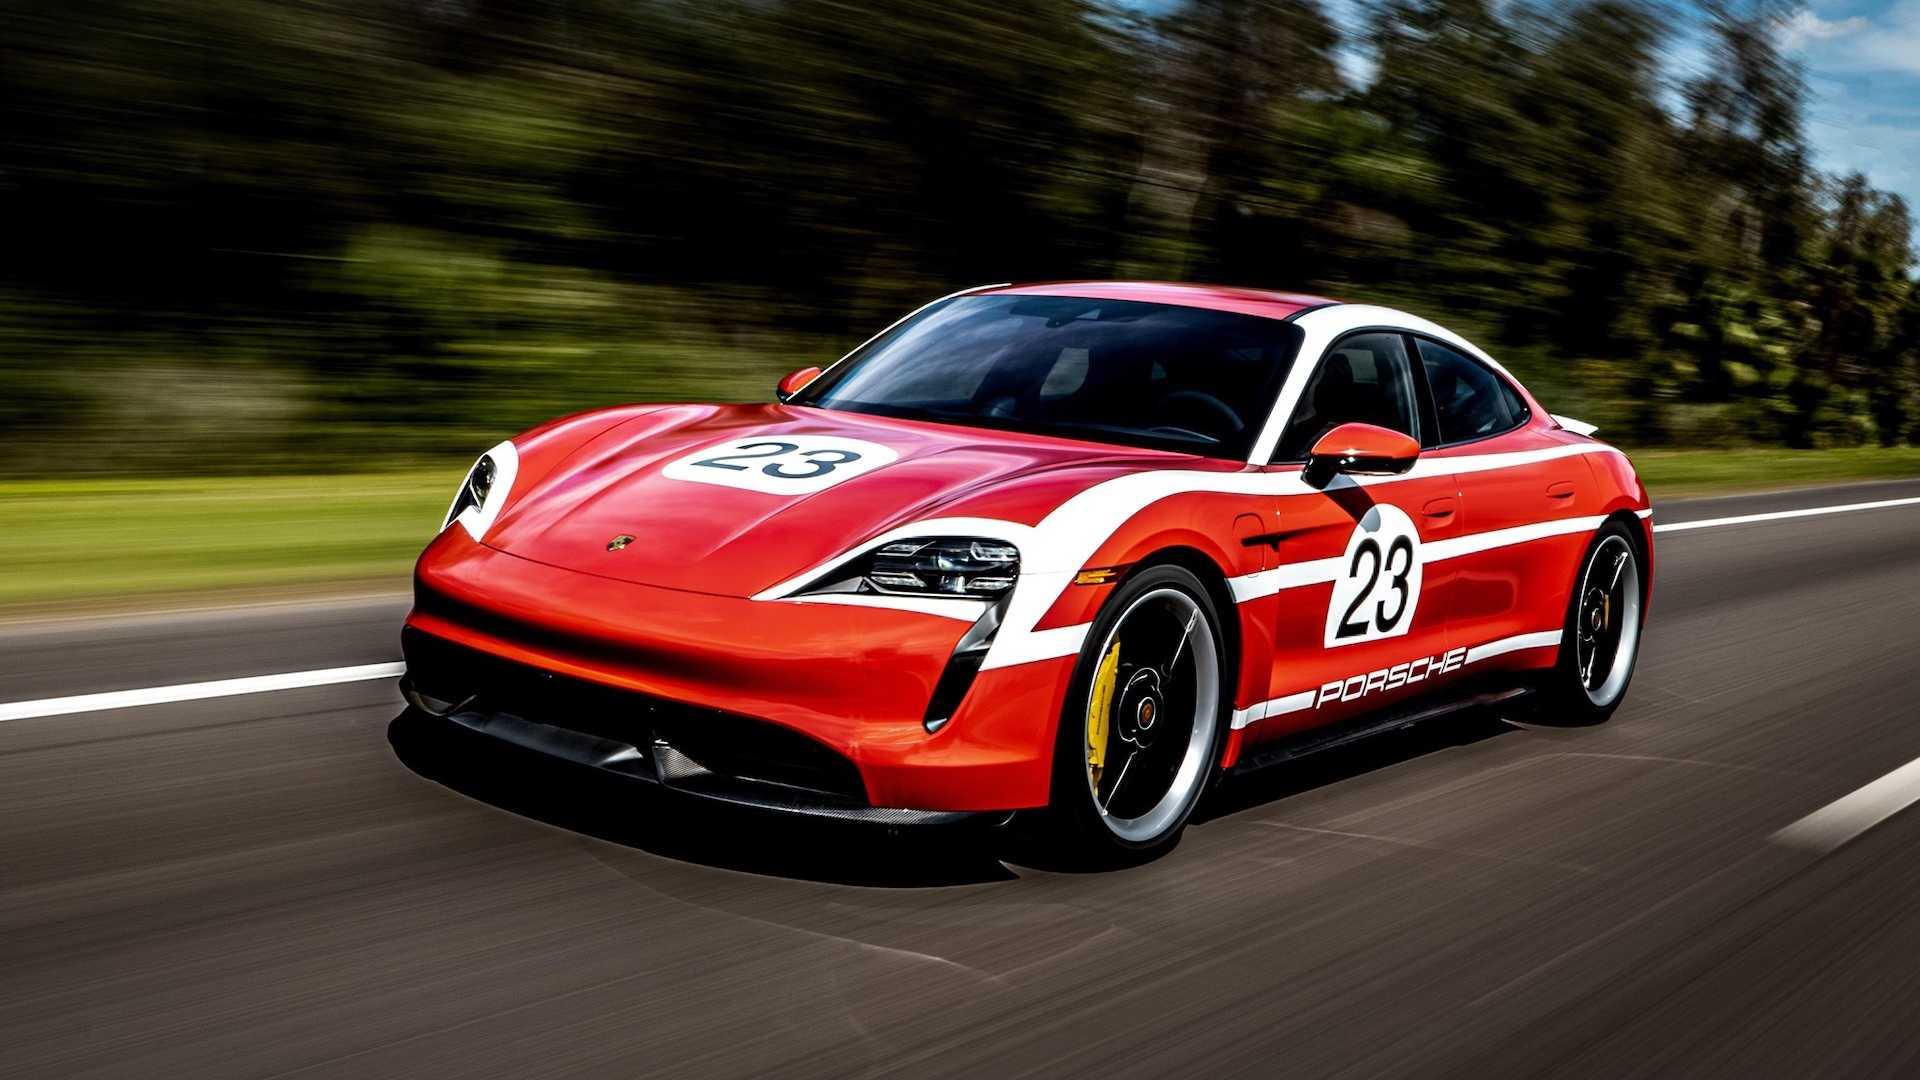 Porsche-Taycan-In-Racing-Liveries-4